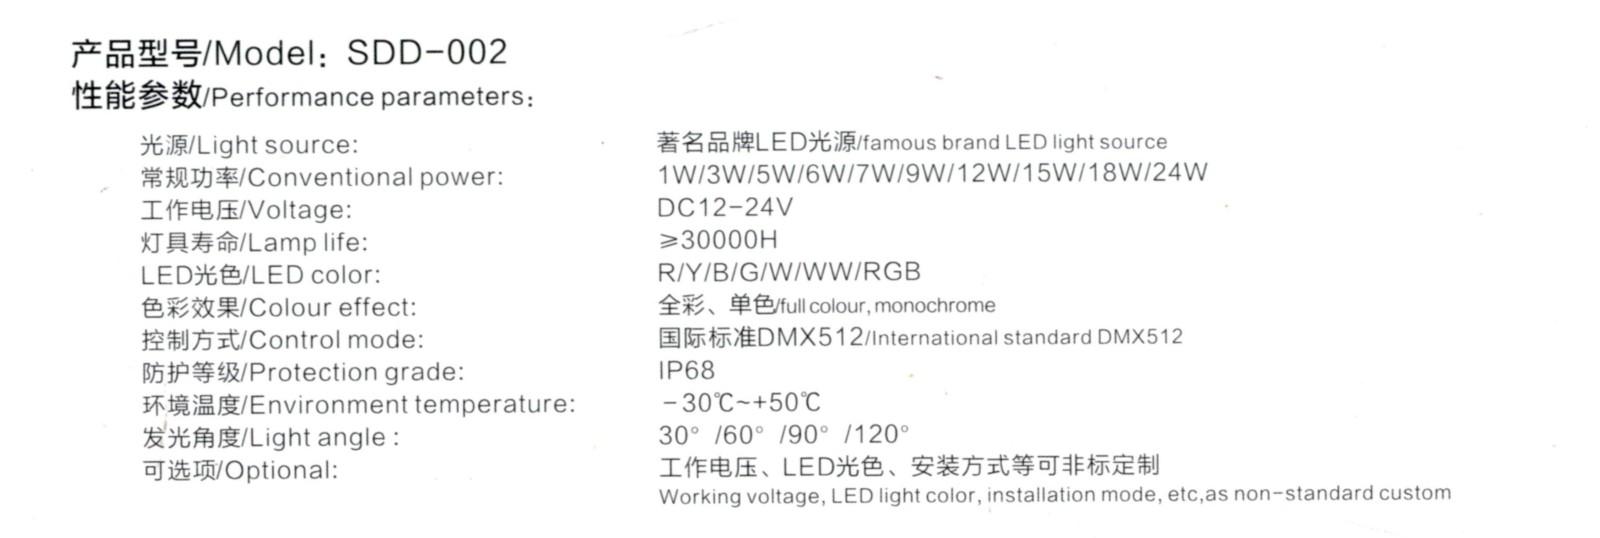 LED水底灯Model∶SDD-002参数.jpg